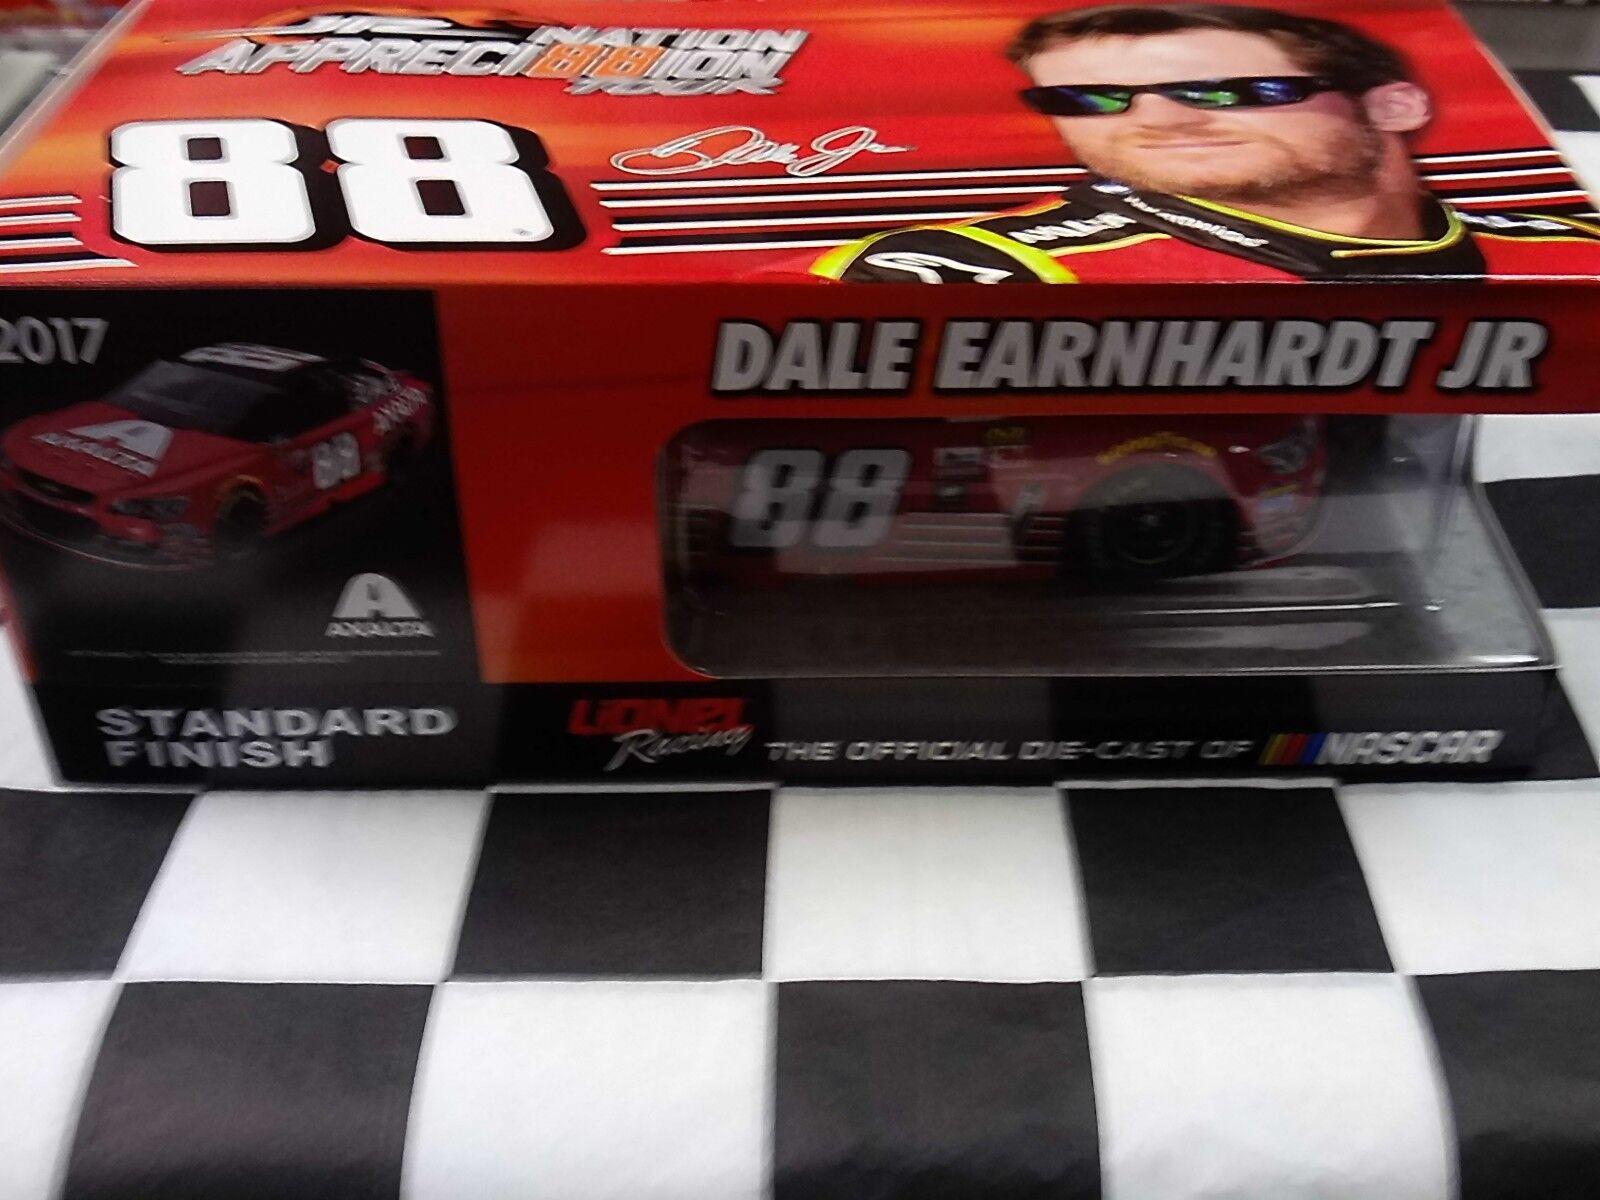 Dale Earnhardt Jr 2017 Axalta Homestead Last Ride 2017 SS Action 1 24 scale